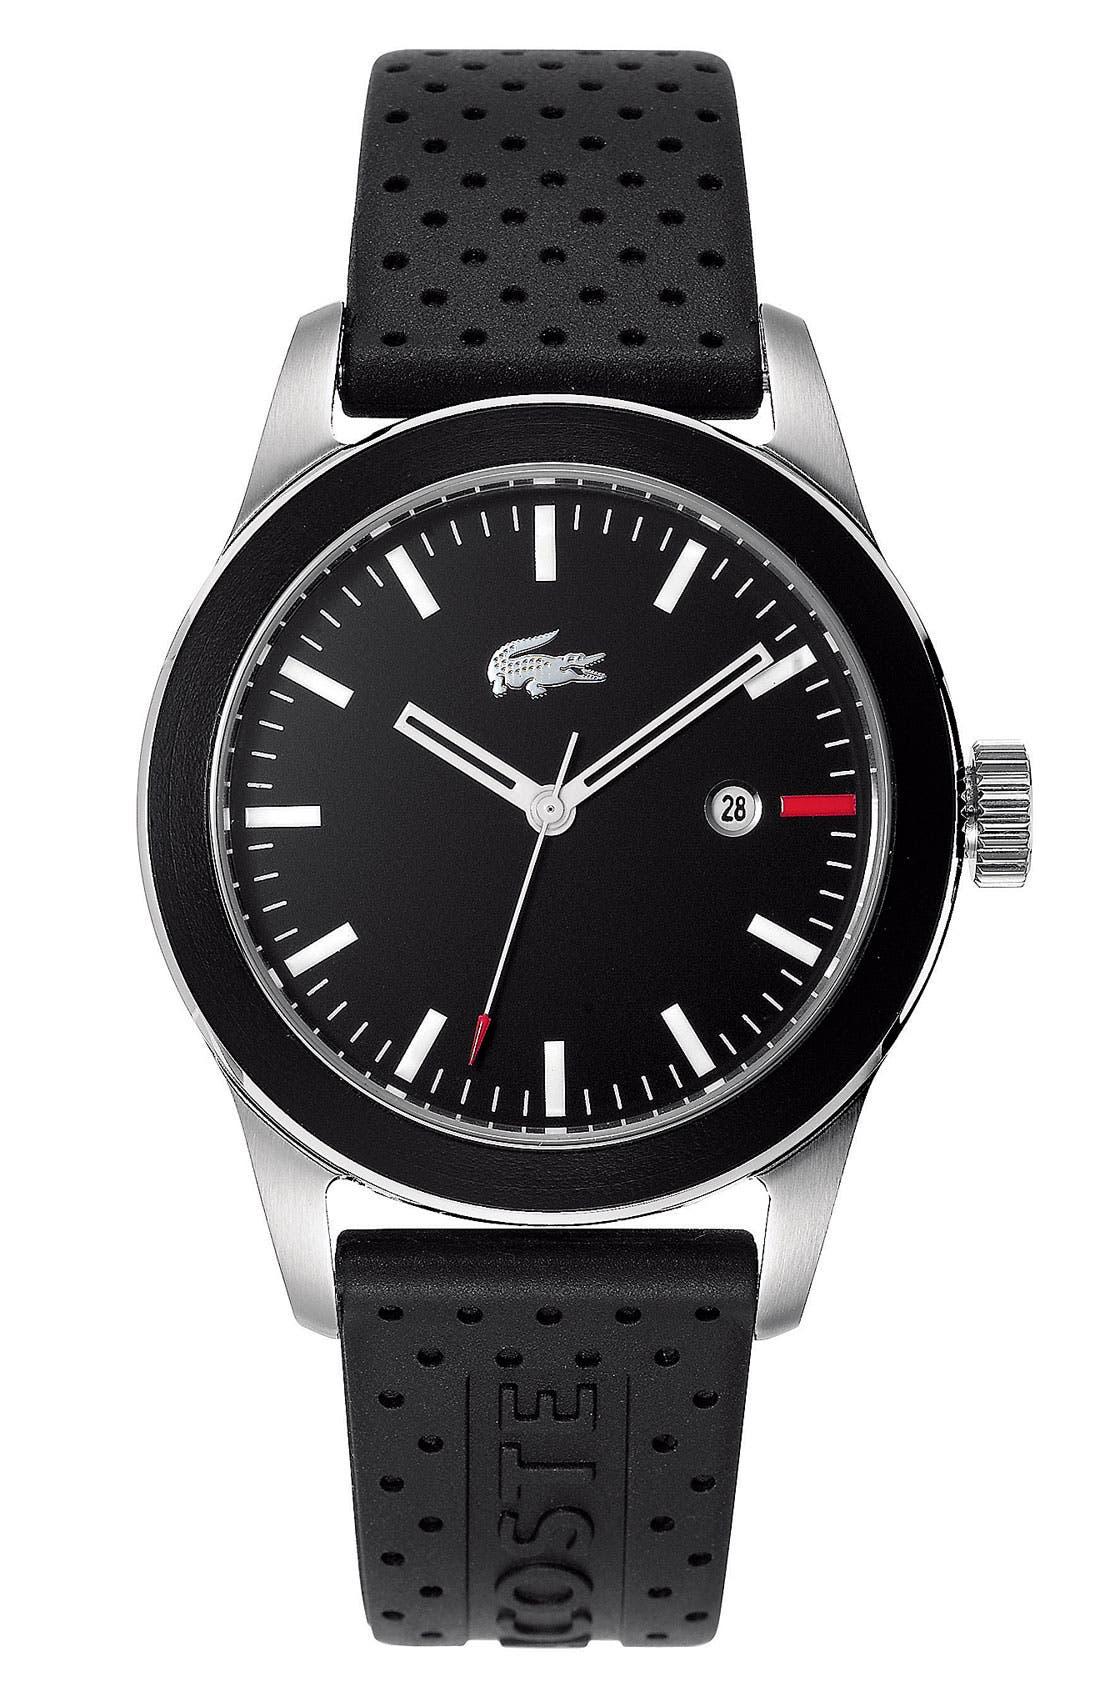 Main Image - Lacoste 'Advantage' Men's Round Watch, 42mm